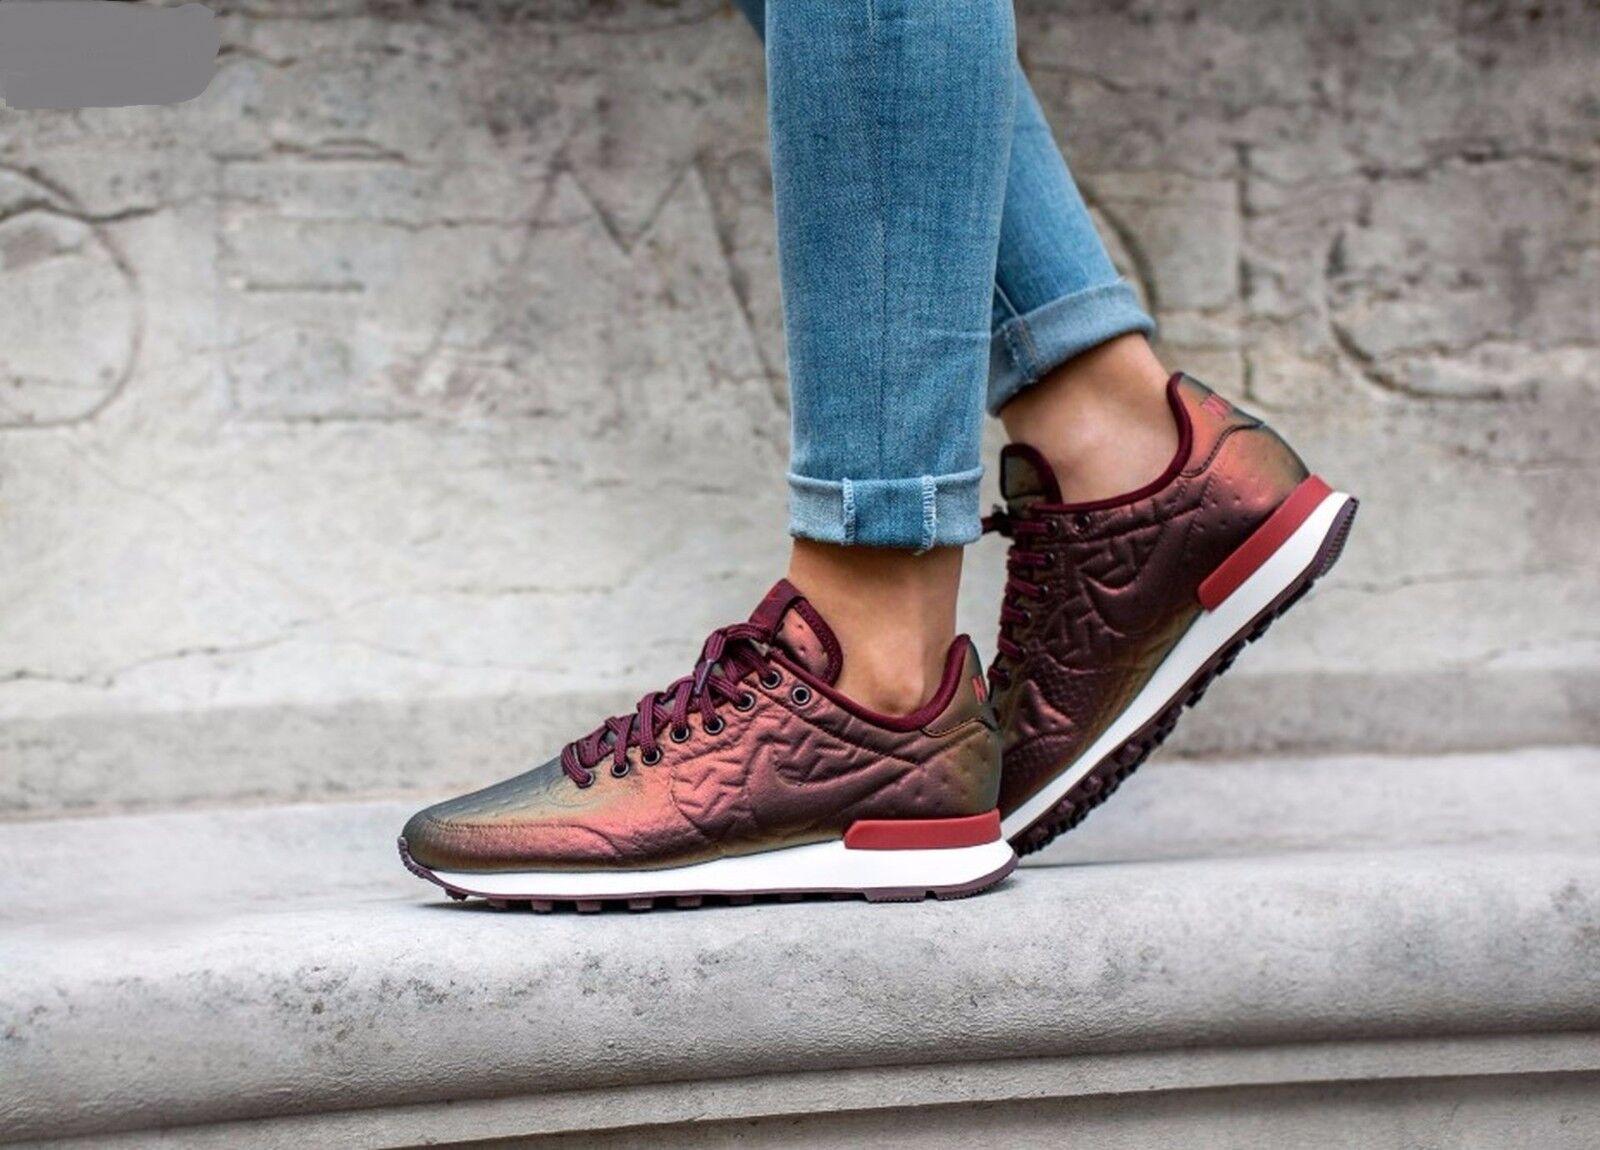 Nike Internationalist JCRD WNTR 859544-900 Wmn Sz 7.5